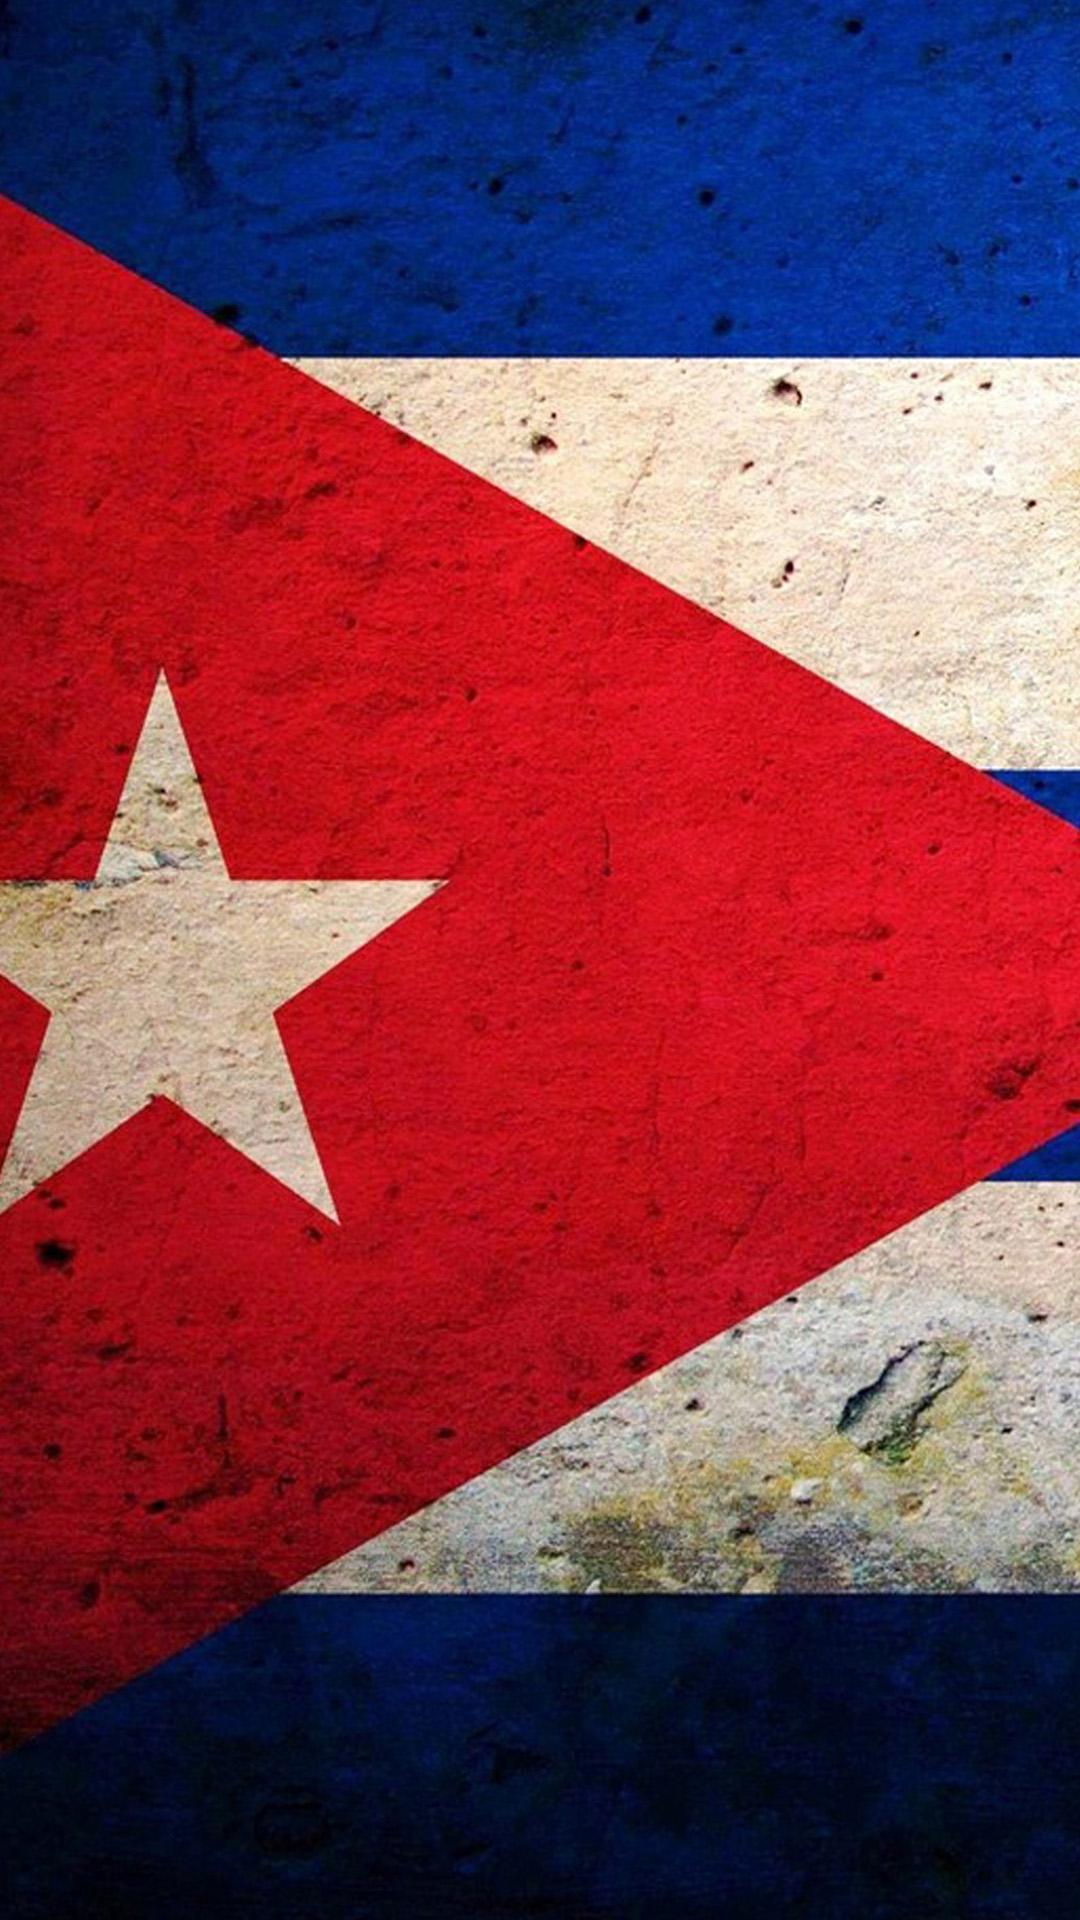 Cuba flag Htc One M8 wallpaper Htc One M8 Wallpaper 1080x1920